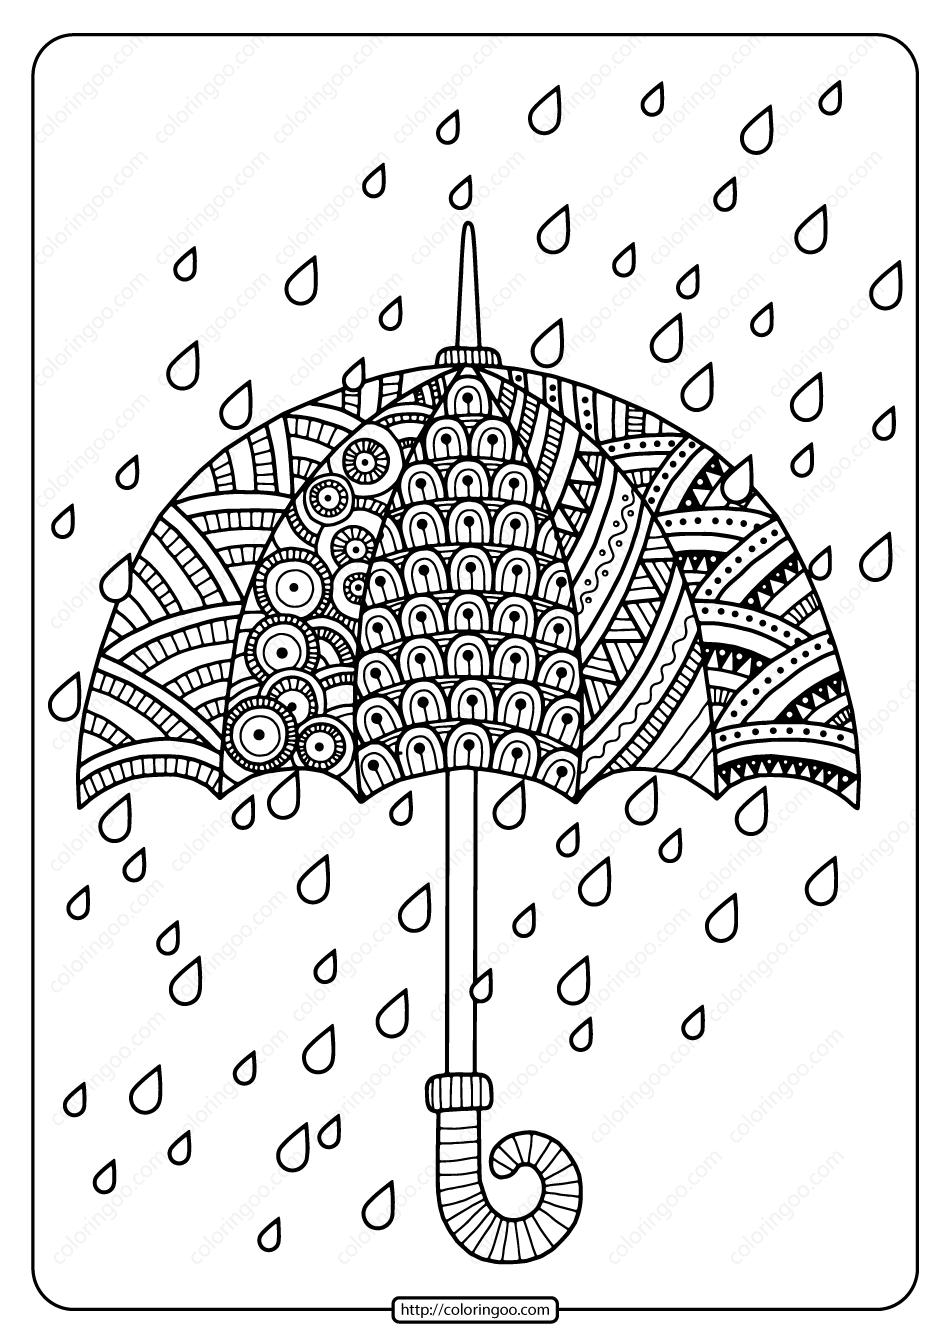 Printable Rain Drops with Umbrella Coloring Page